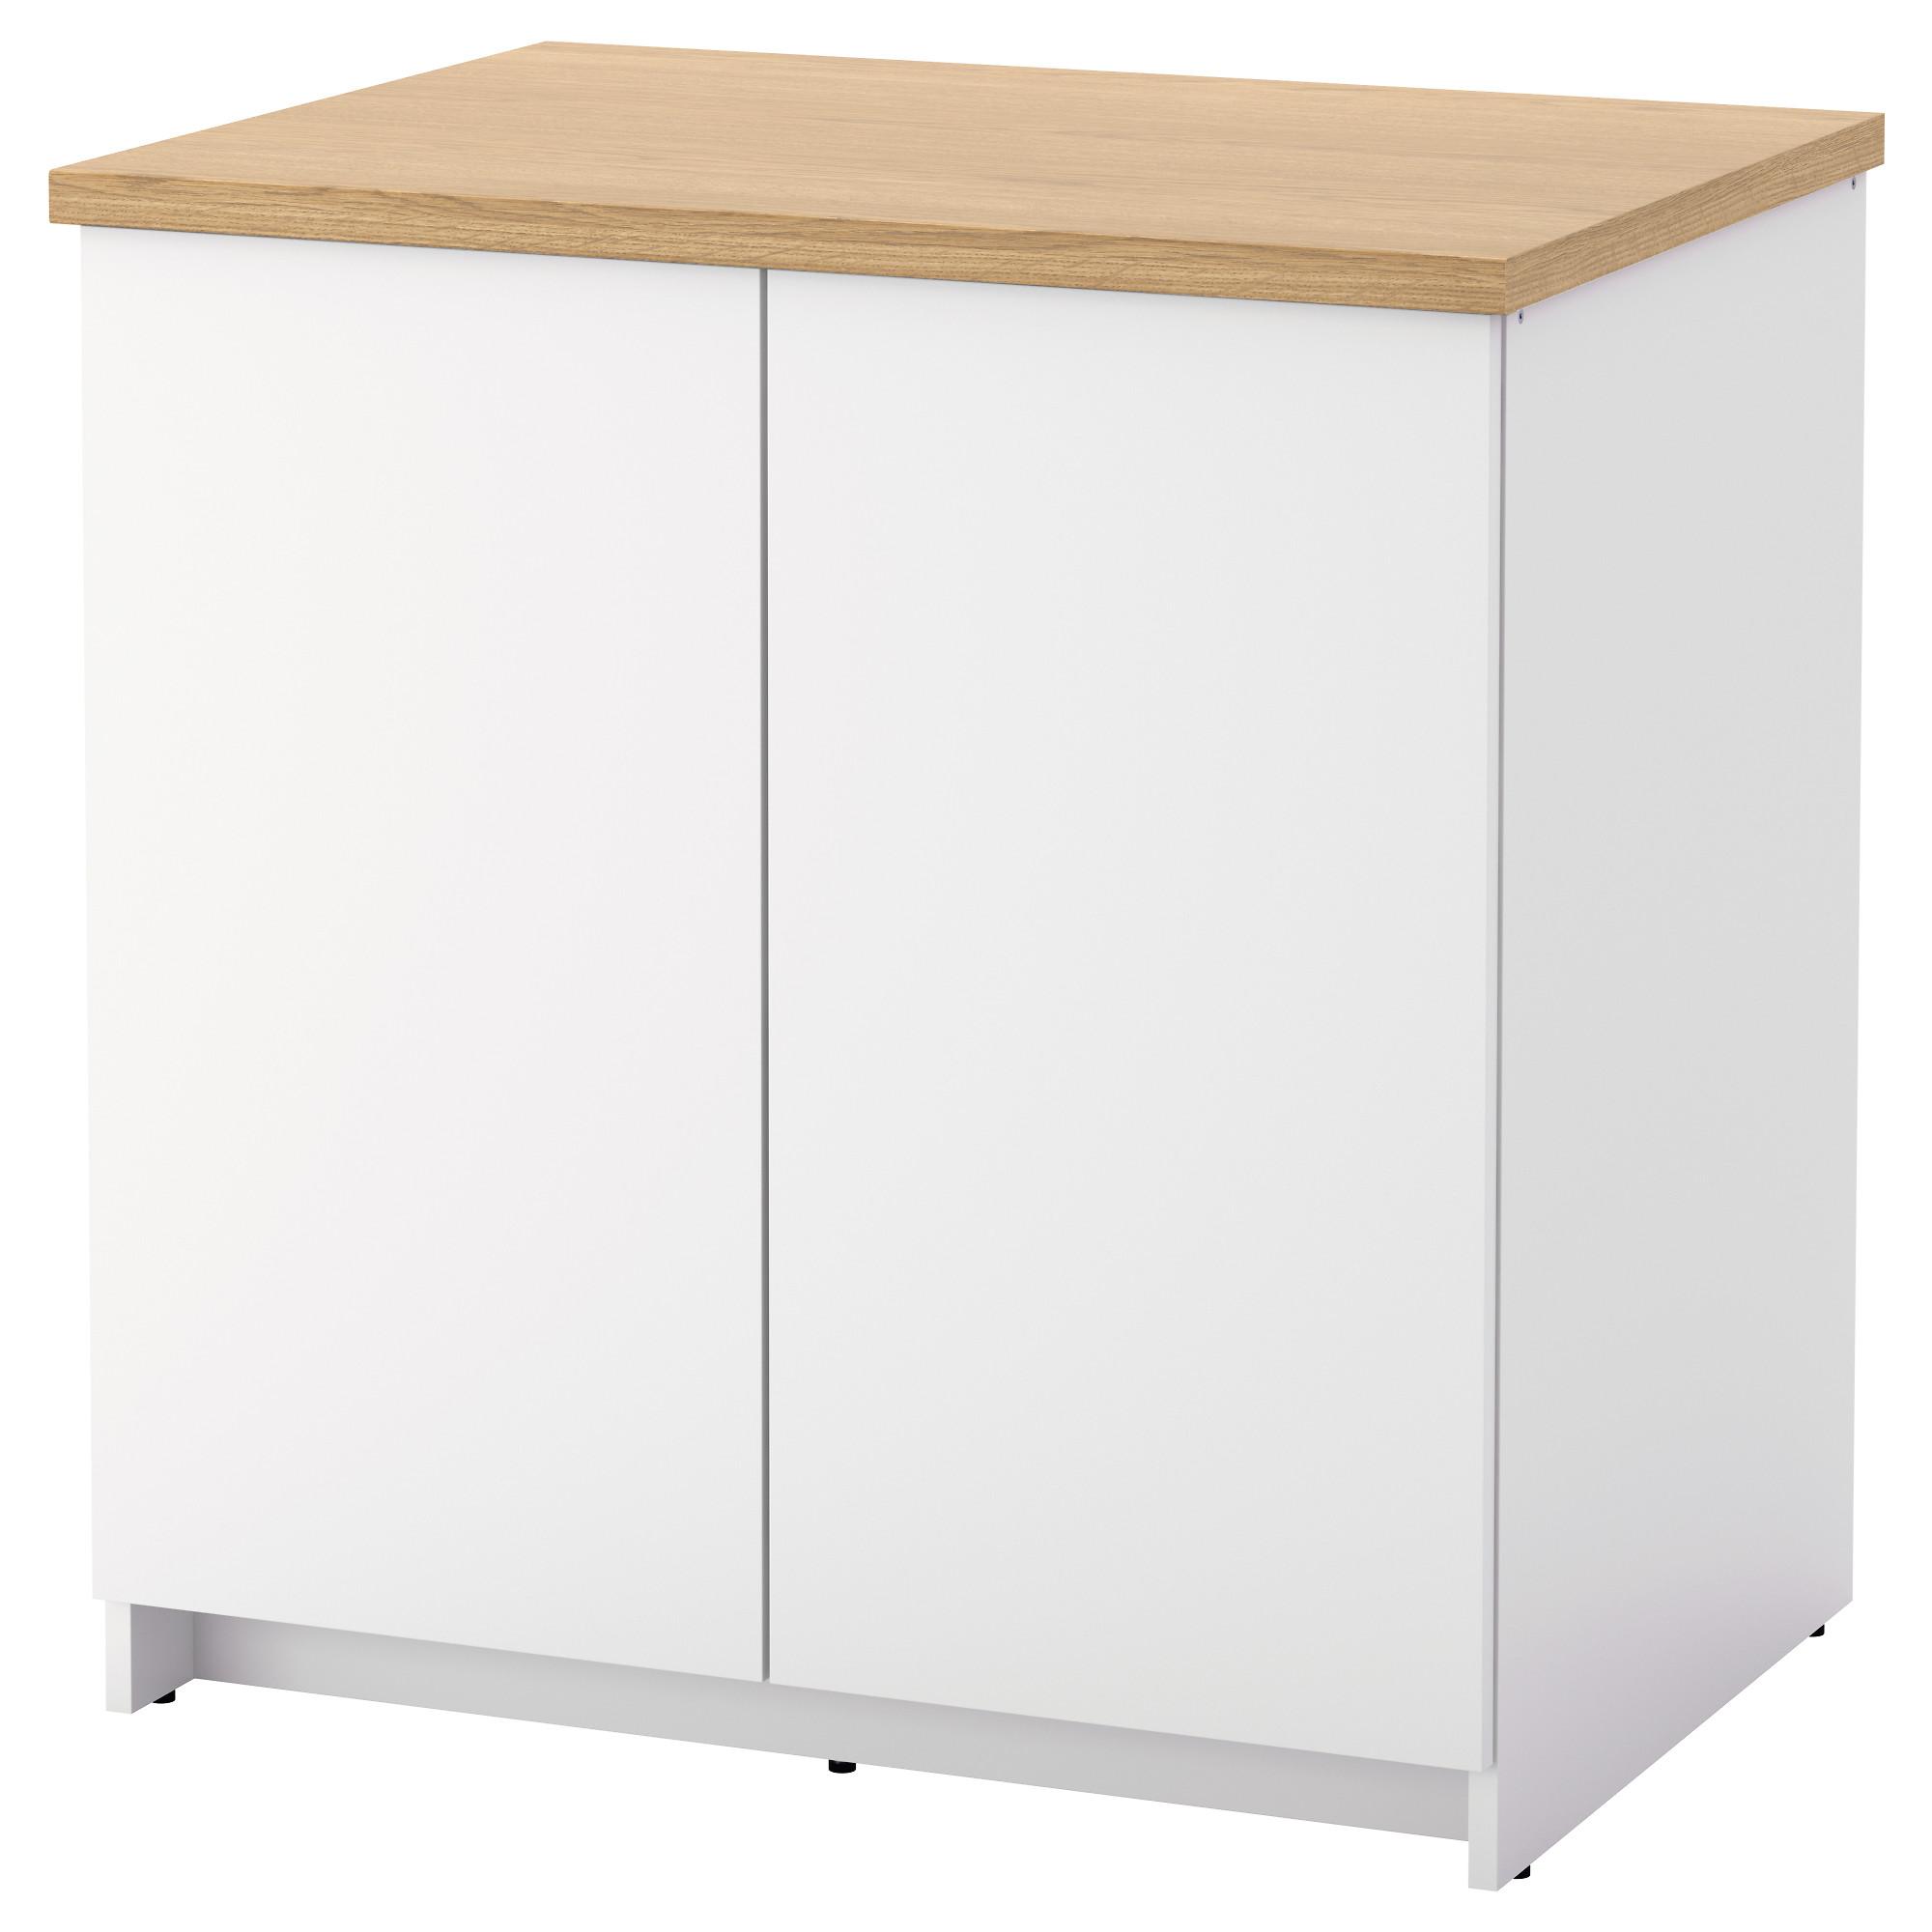 Knoxhult IKEA Kitchen Cabinets, - Komnit Store